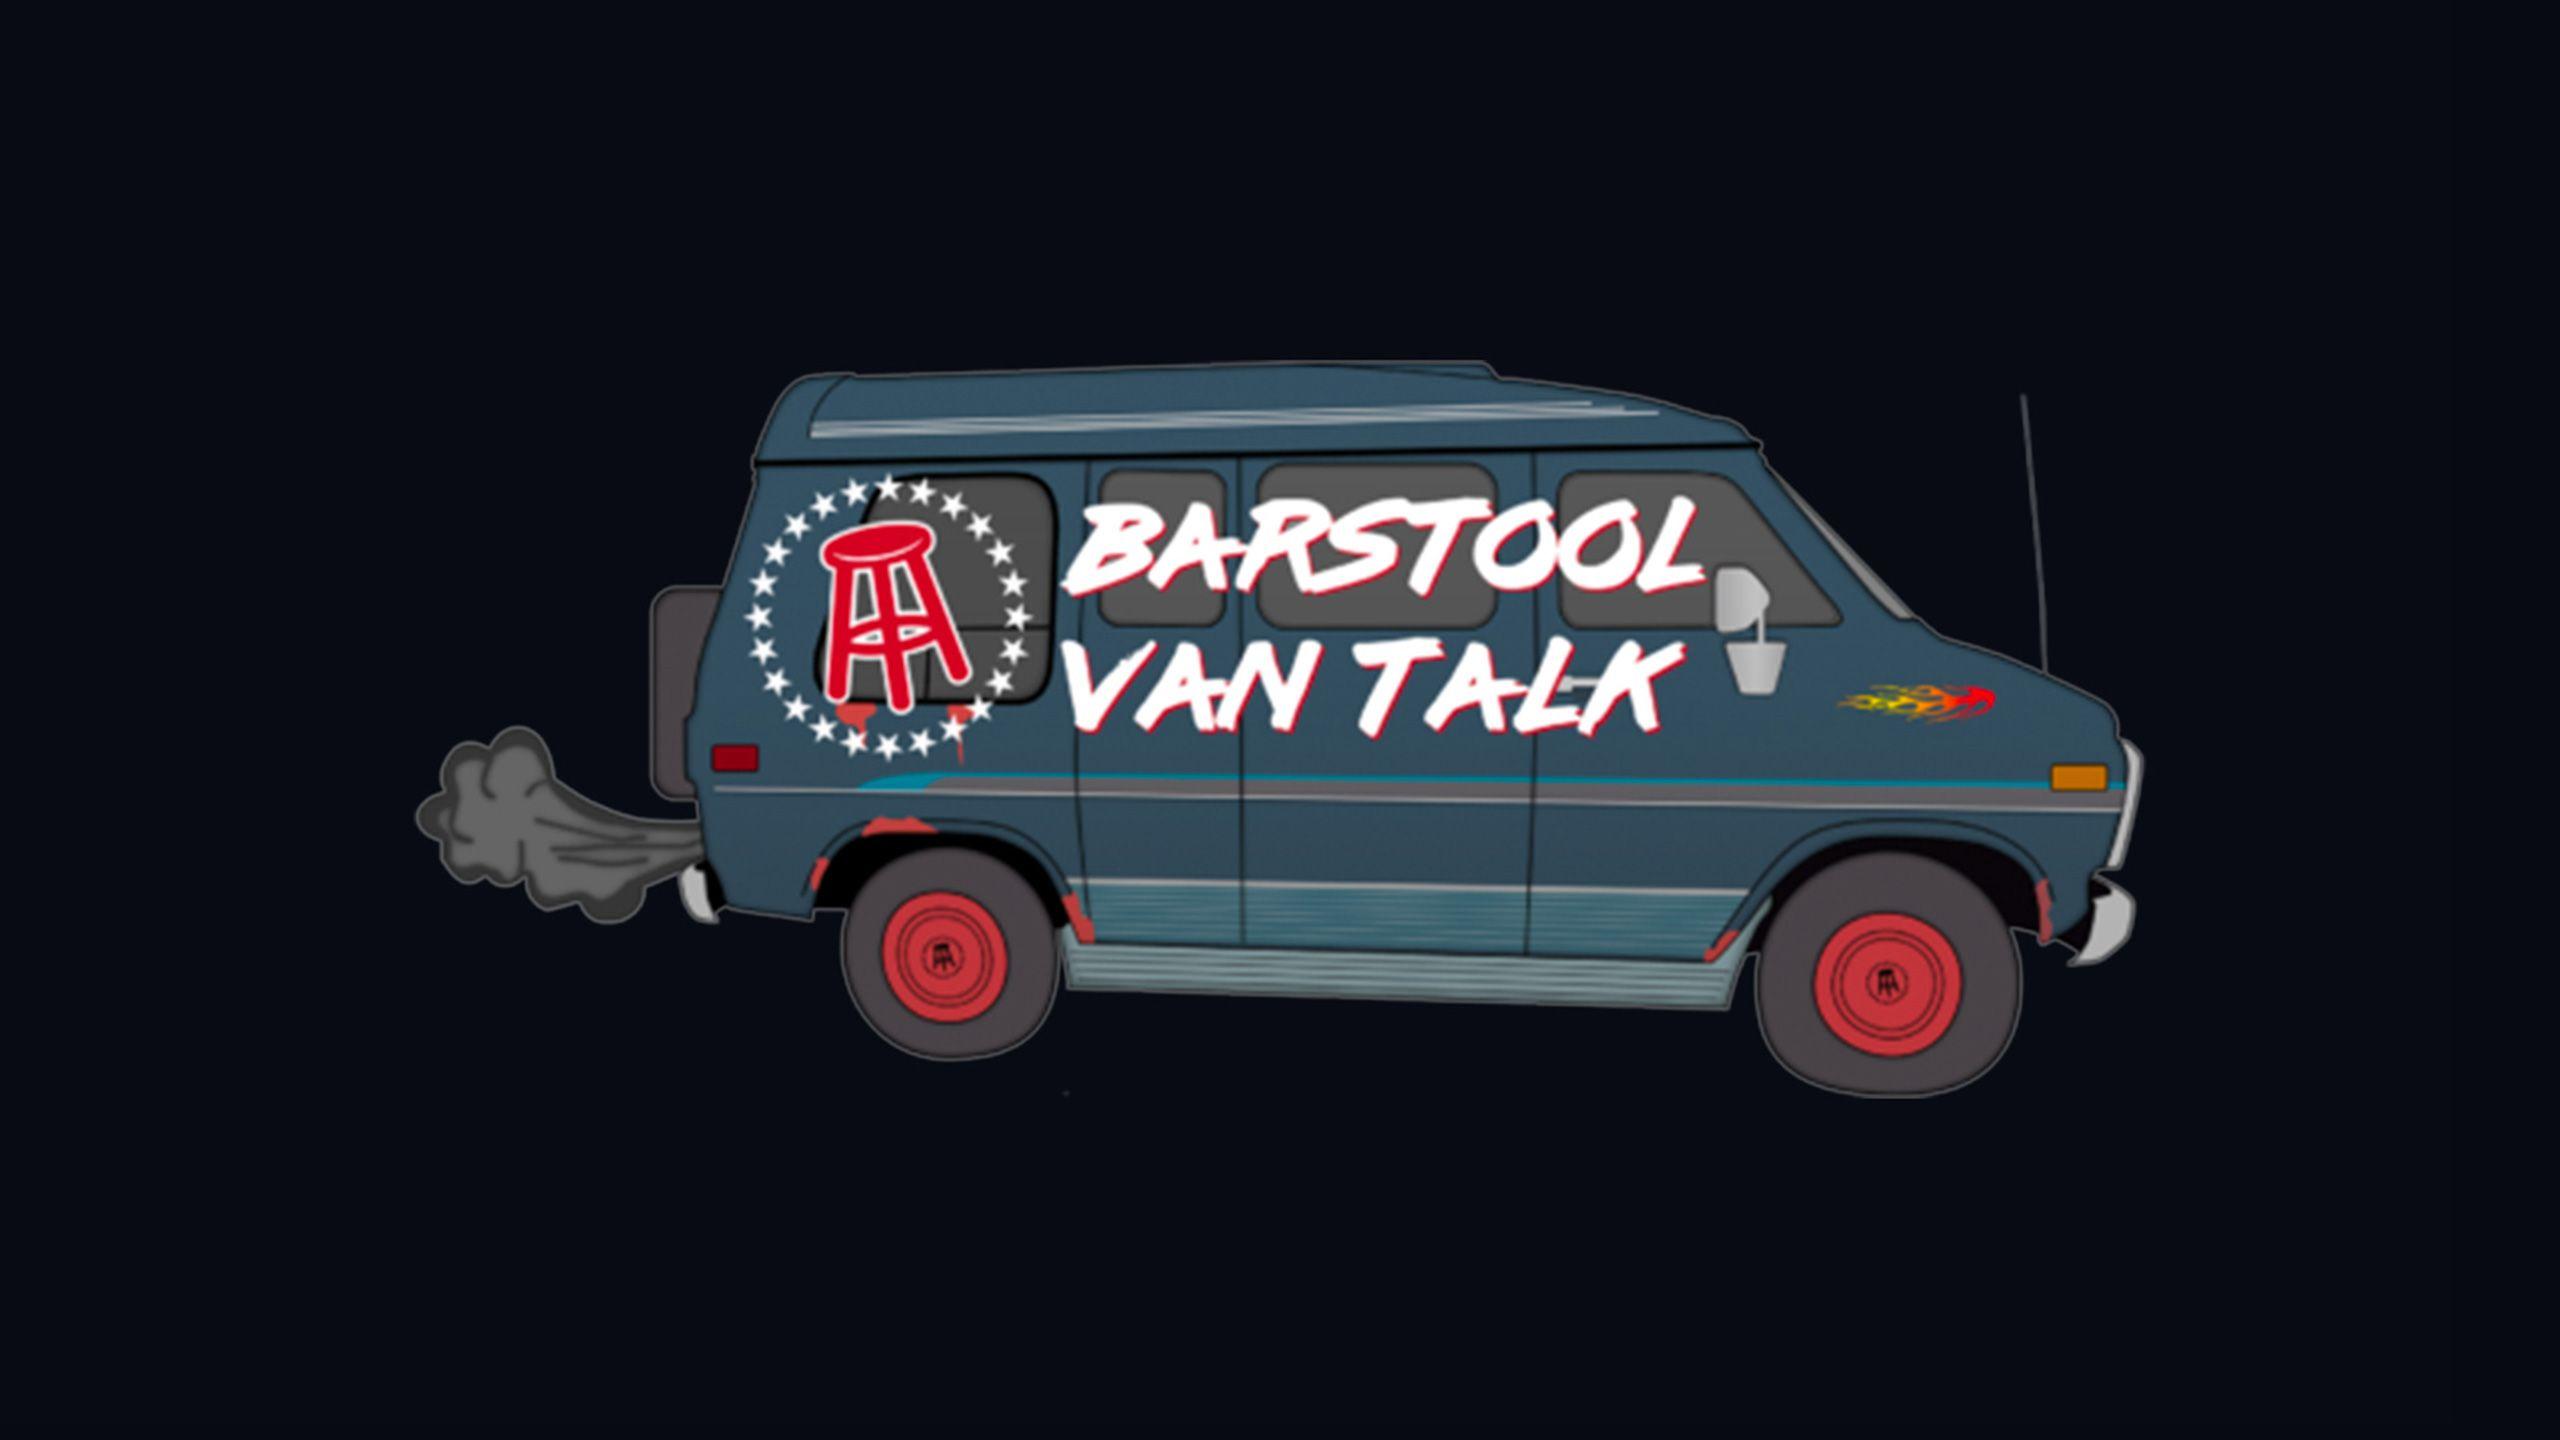 Barstool Van Talk